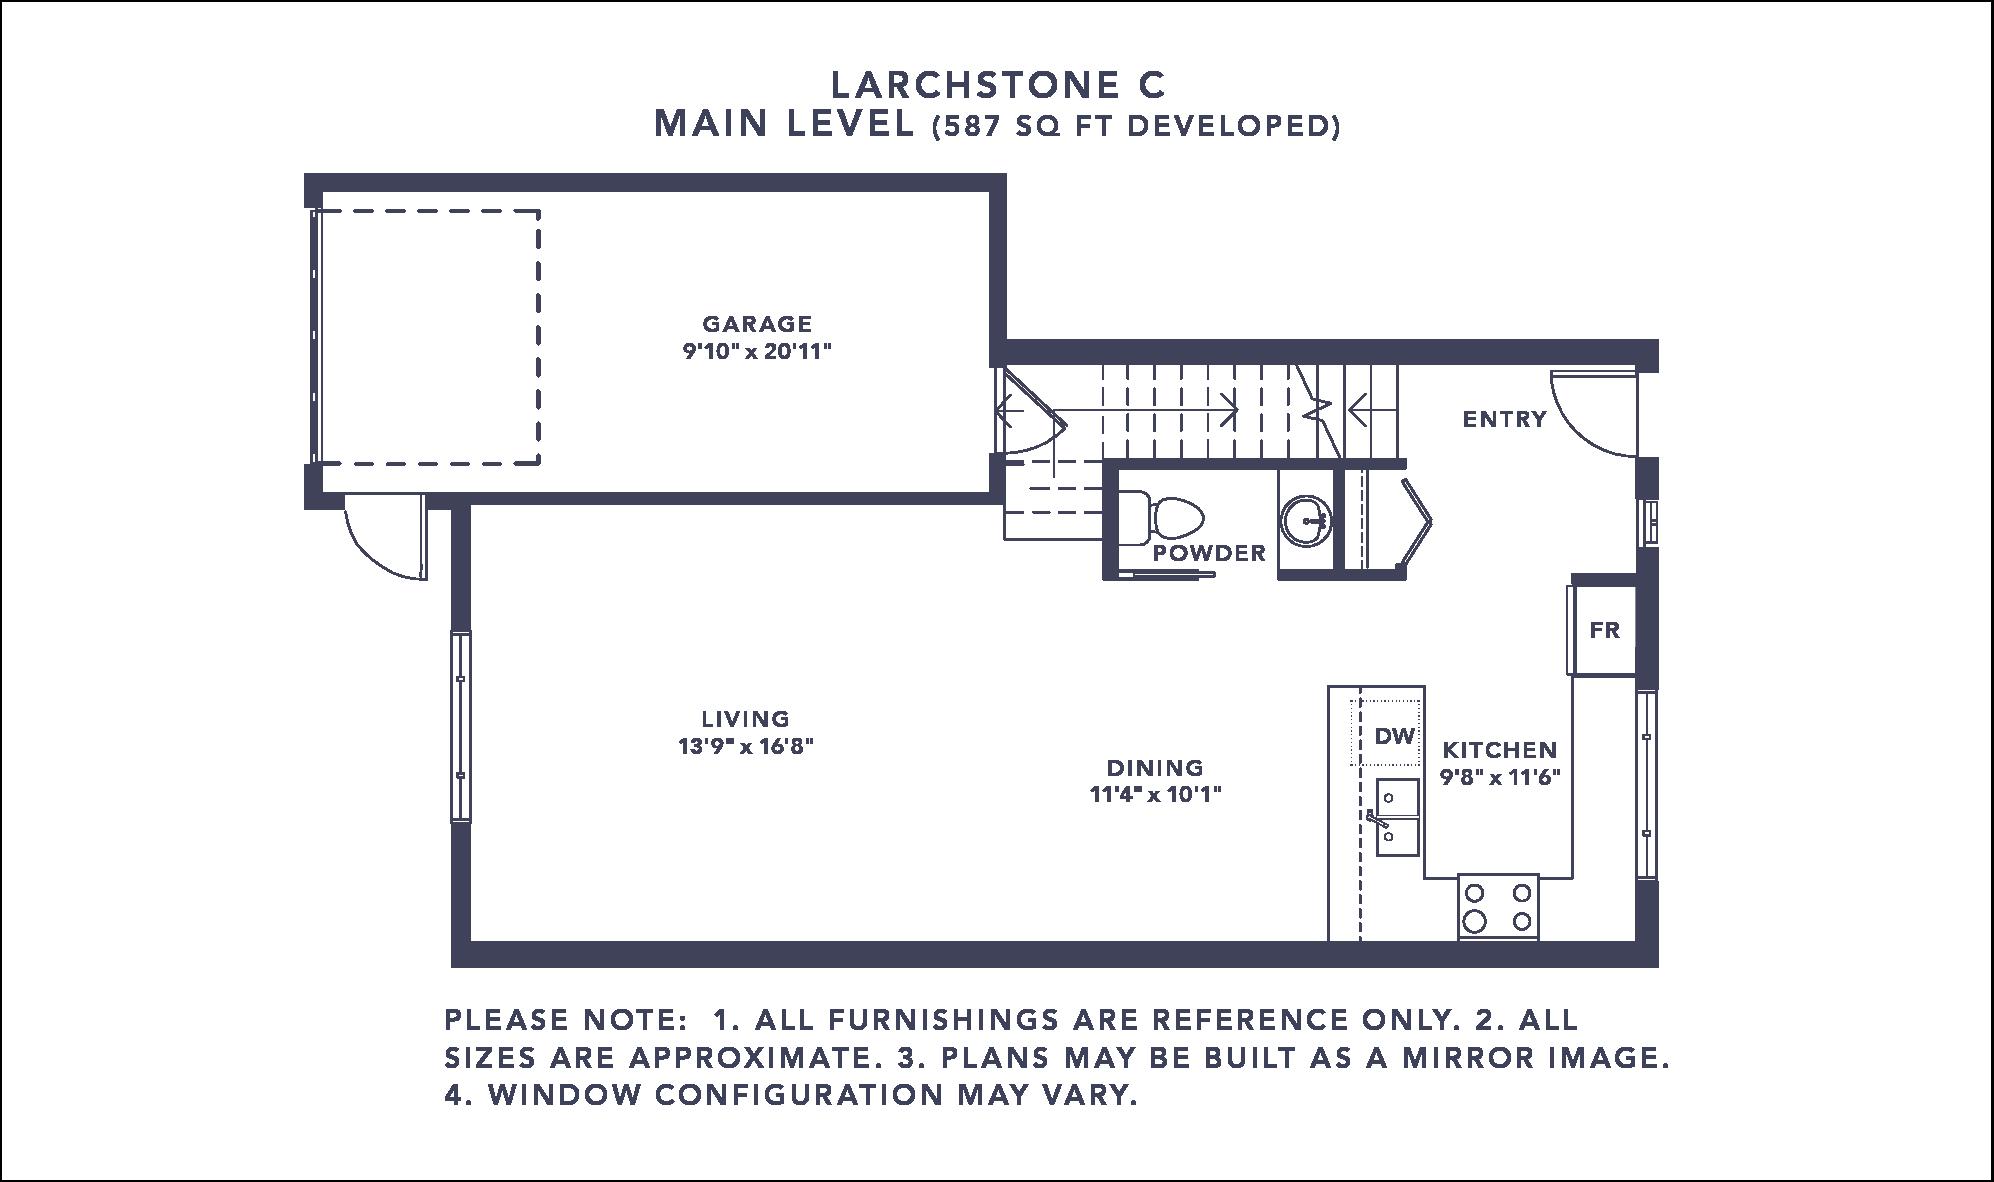 Larchstone C Floorplan - Main Level